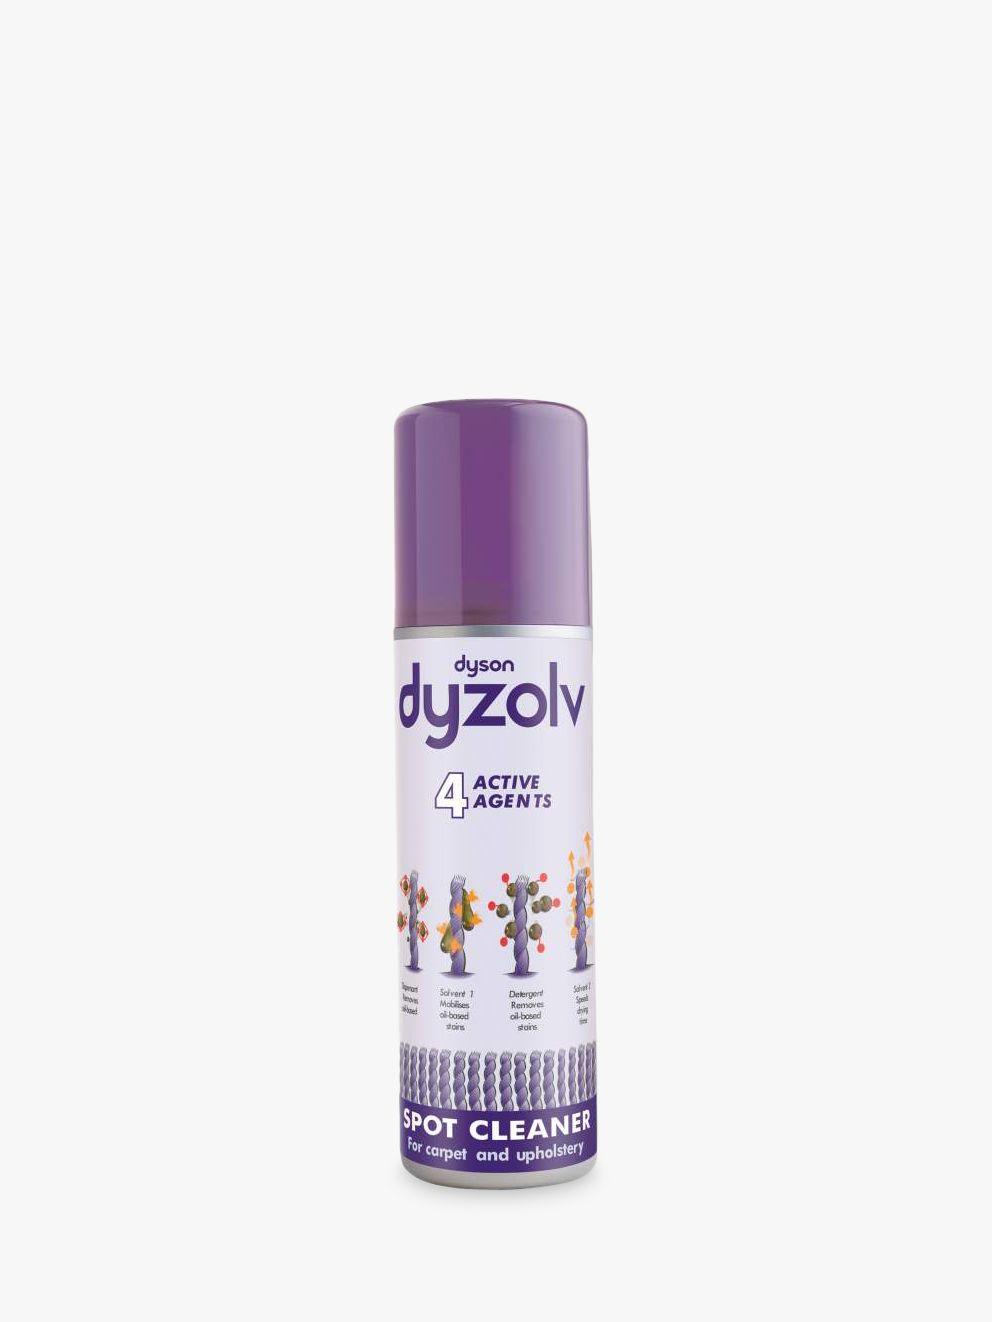 Dyson Dyson Dyzolv Spot Cleaner